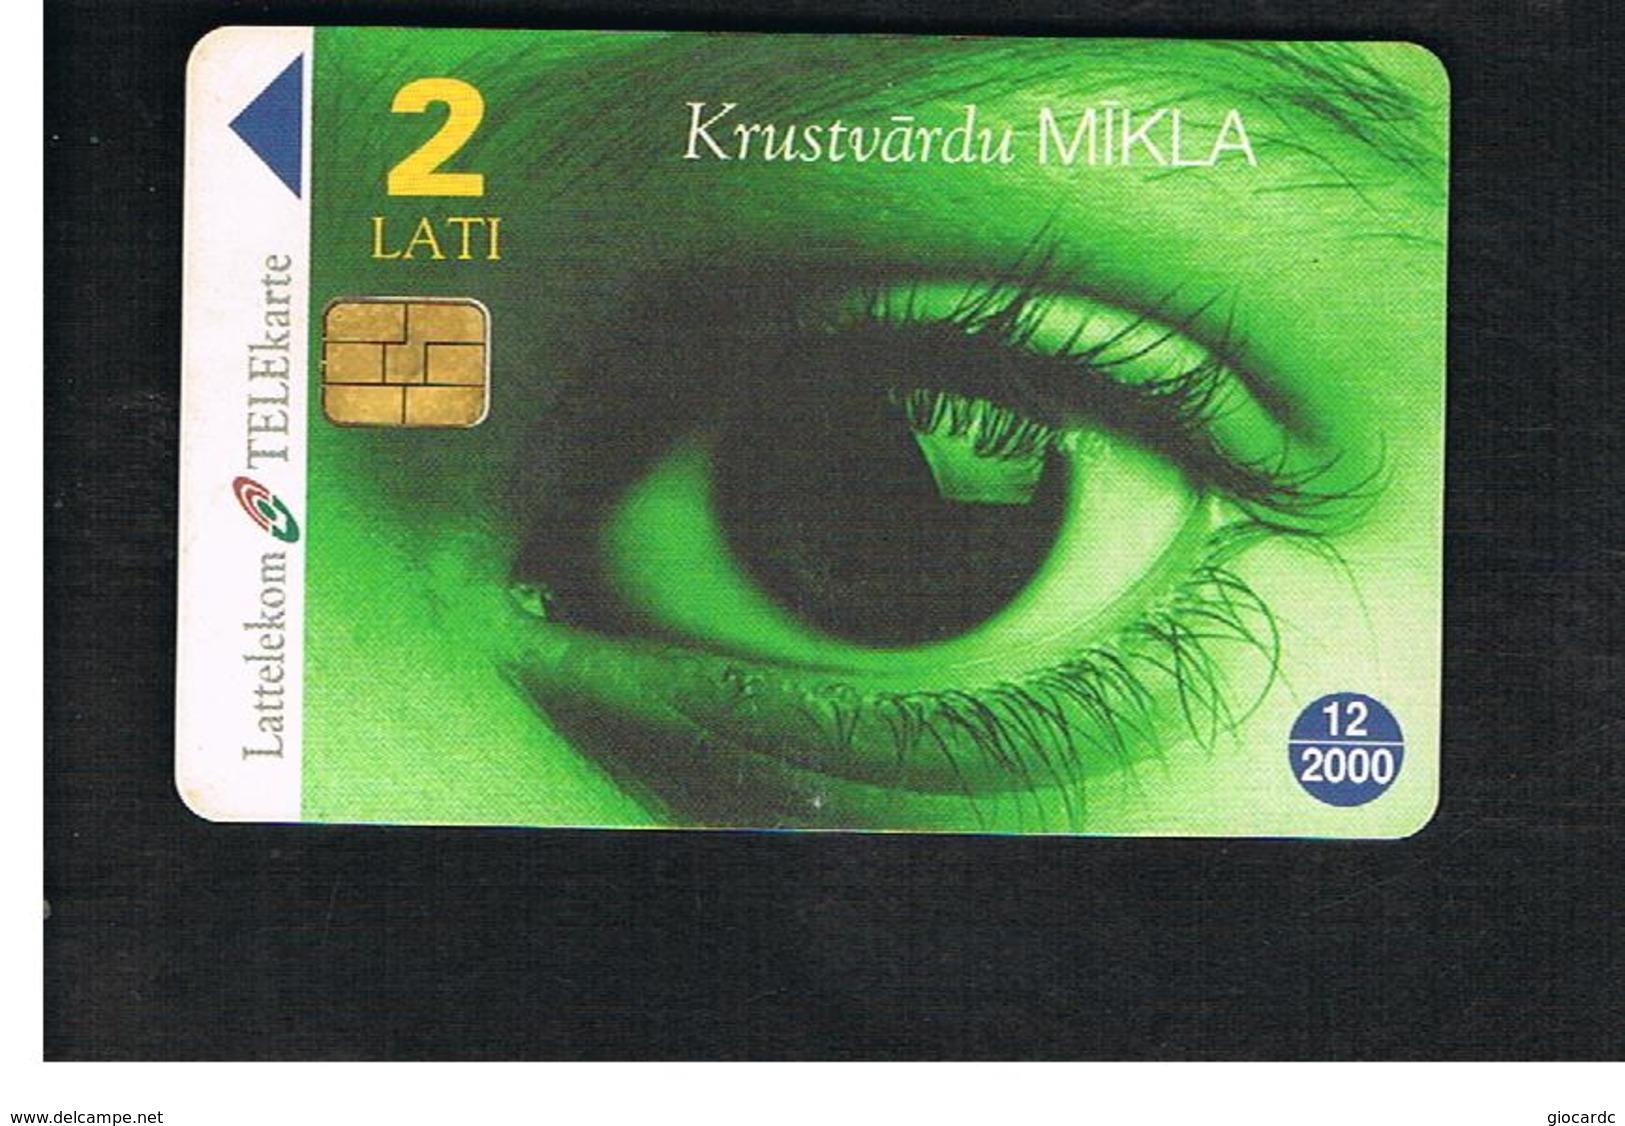 LETTONIA (LATVIA) -        1998 CROSSWORD PUZZLE, EYE             -  USED - RIF. 10595 - Latvia